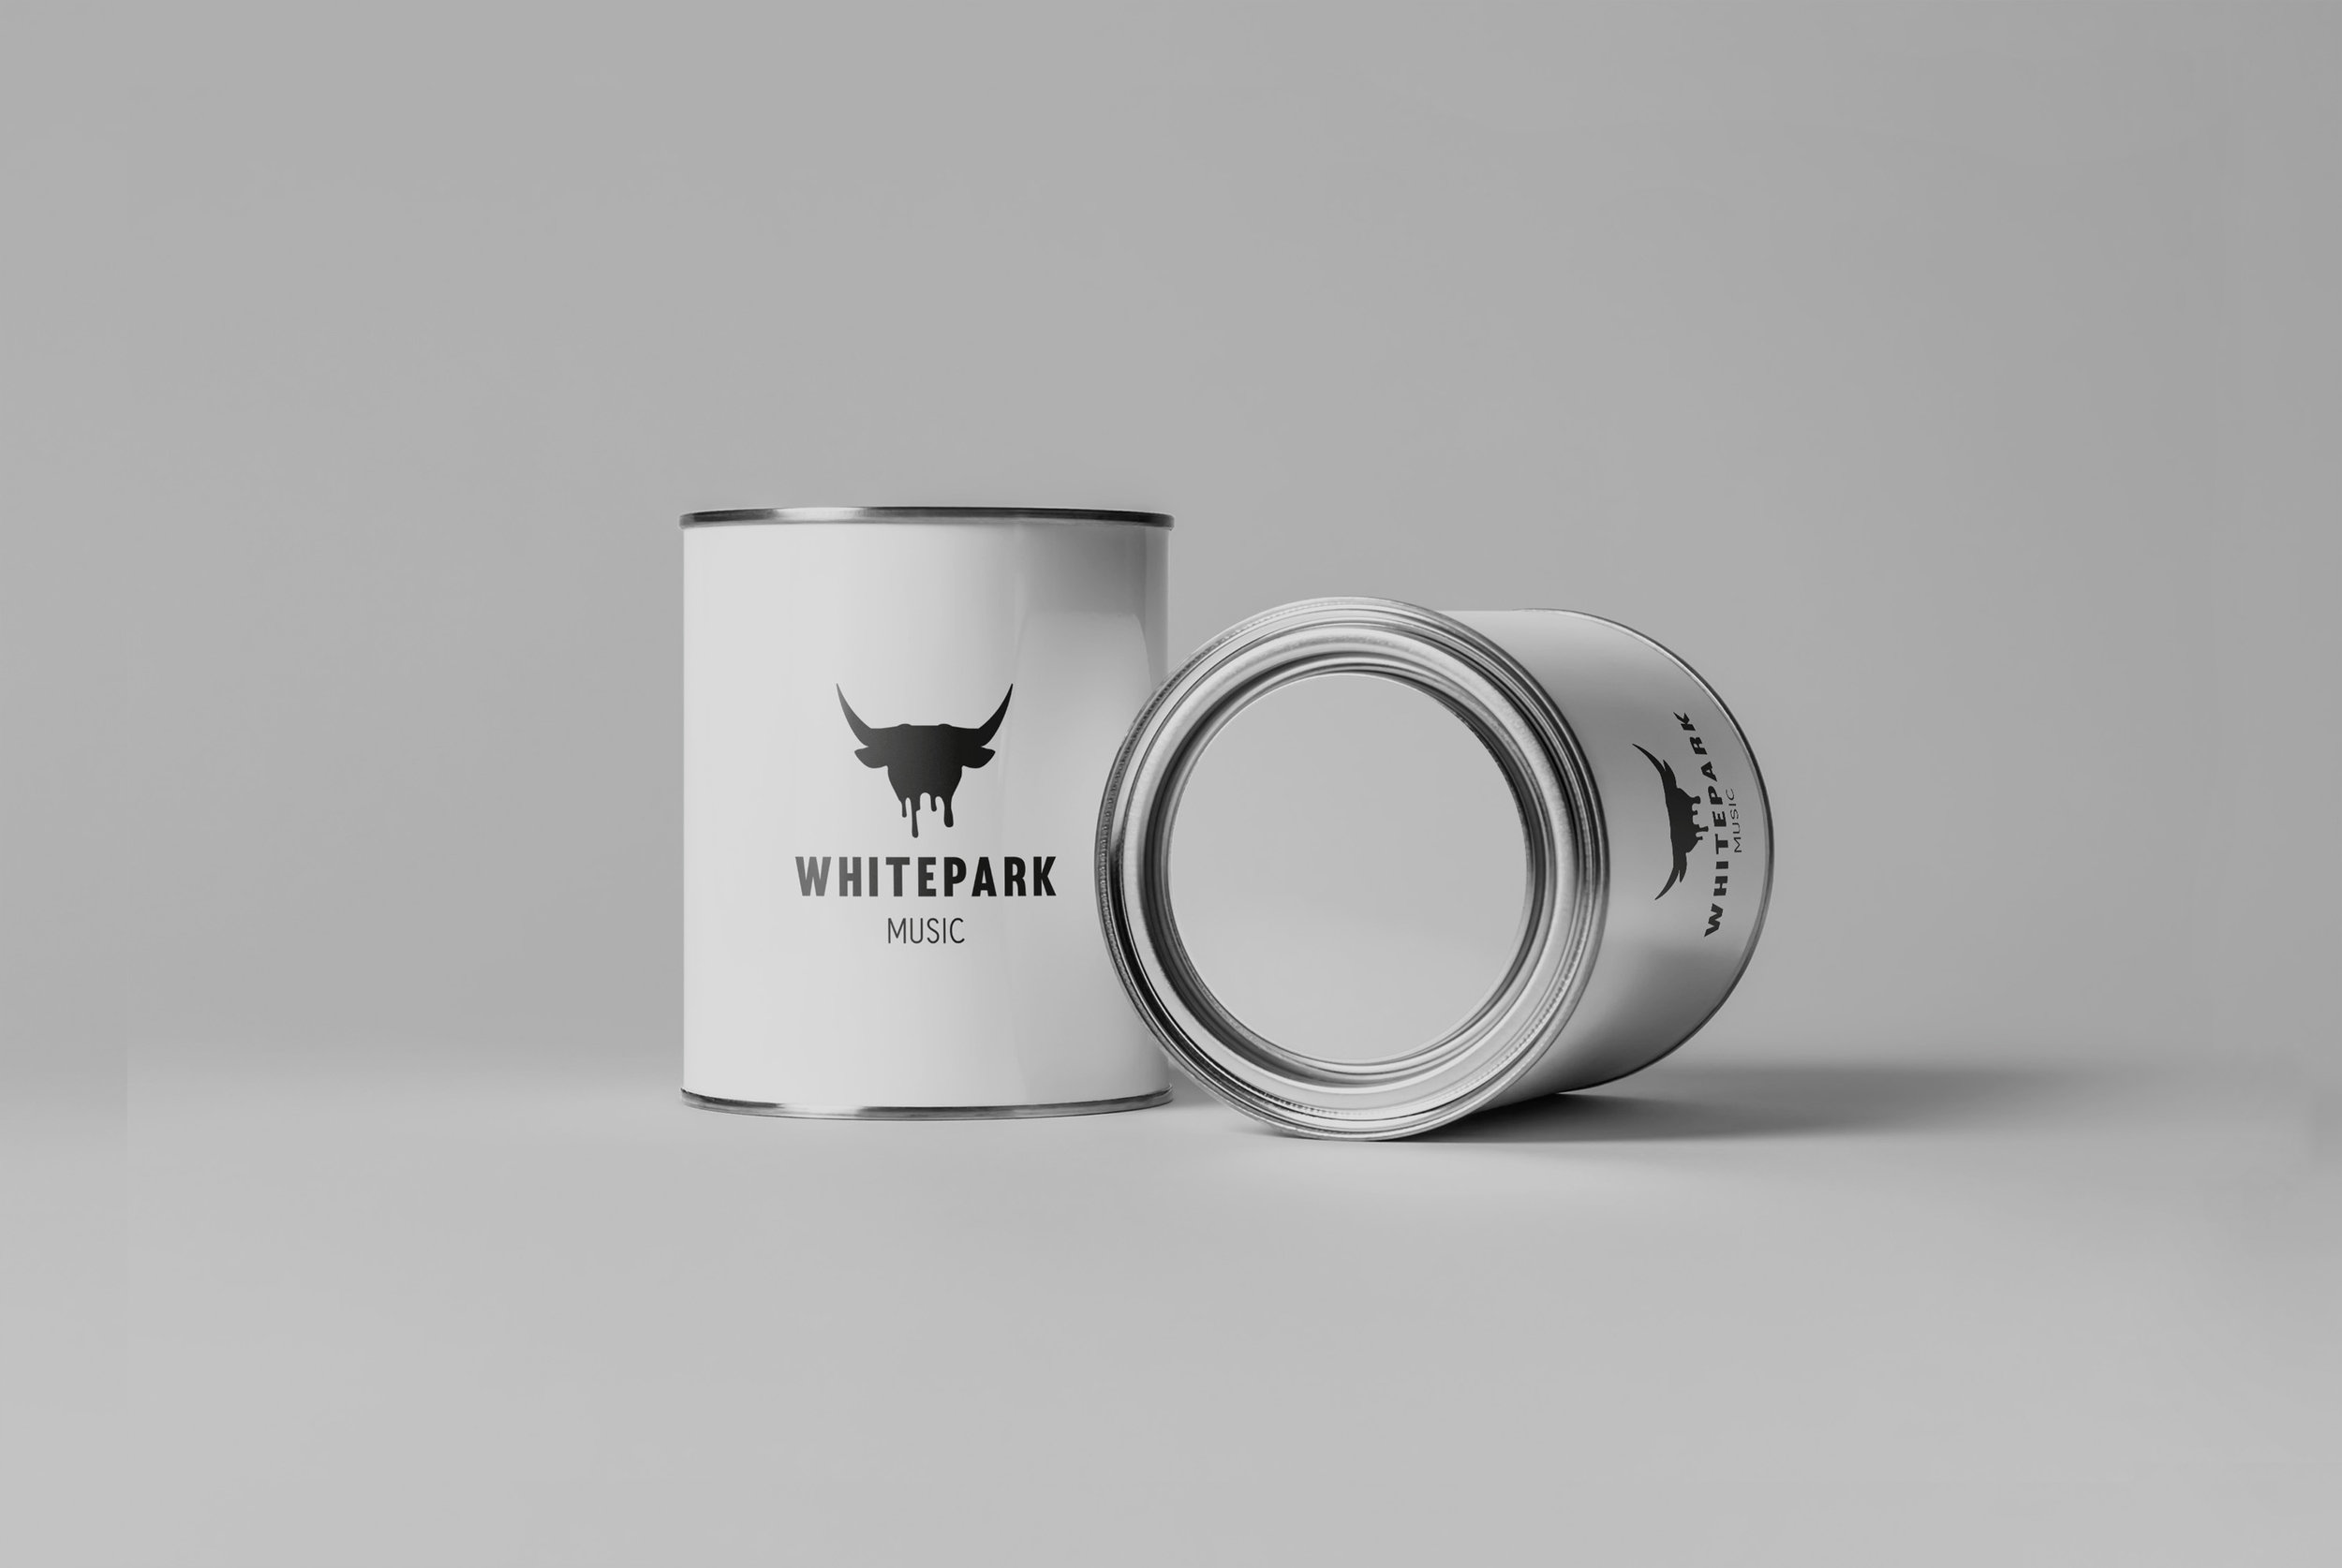 Whitepark_DuziStudio_Branding copy.jpg